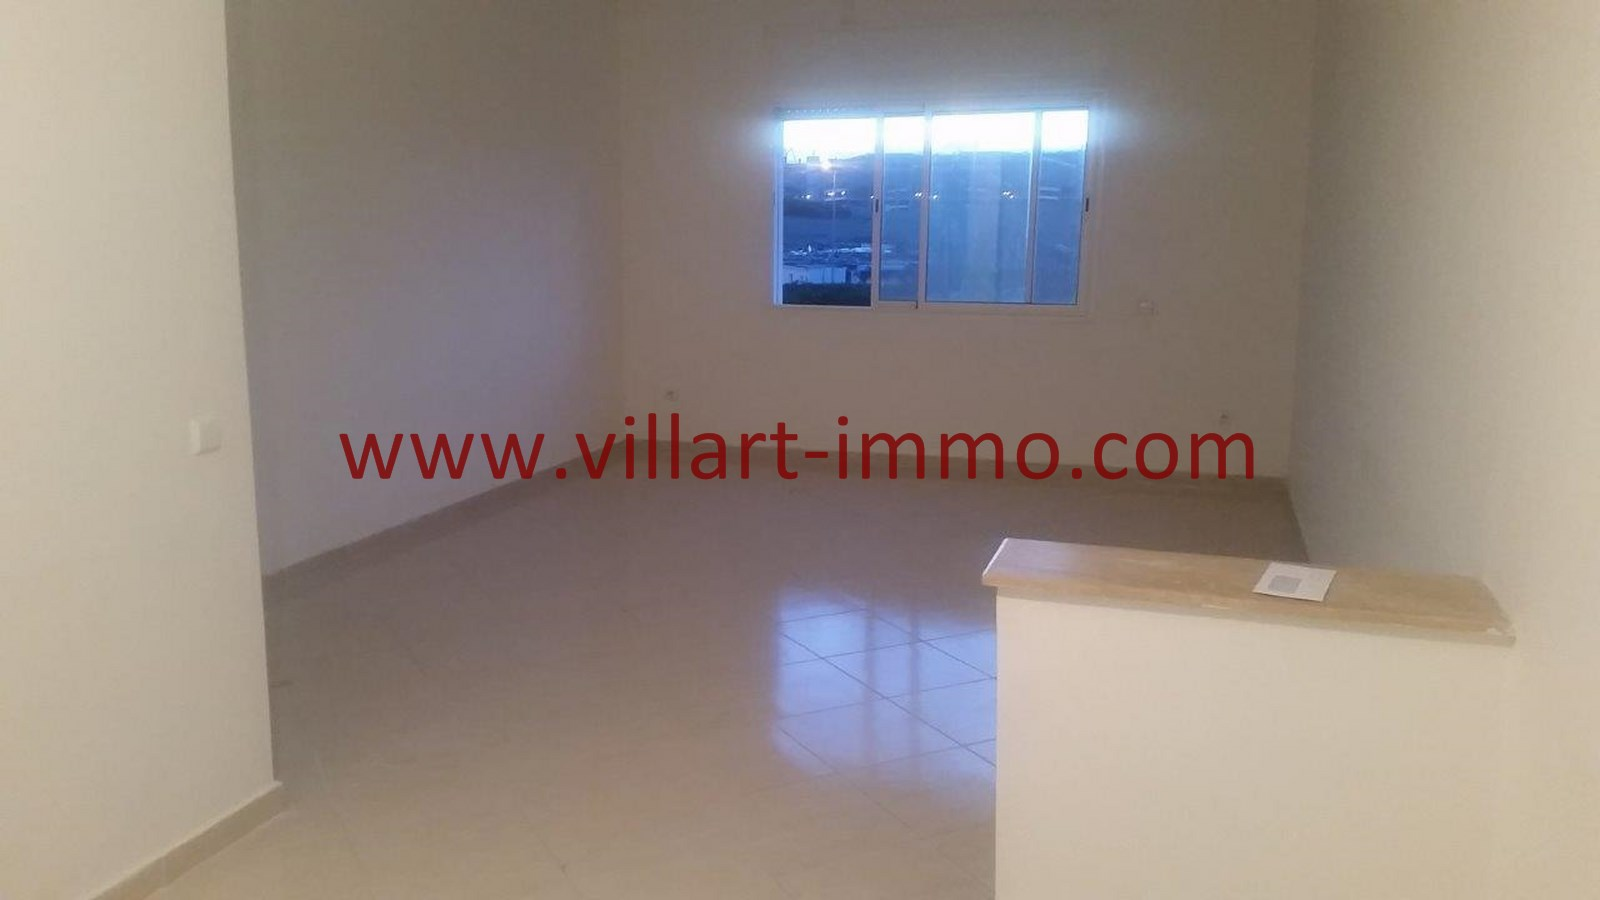 1-Location-Appartement-Non meublé-Tanger-Salon-L913-Villart immo